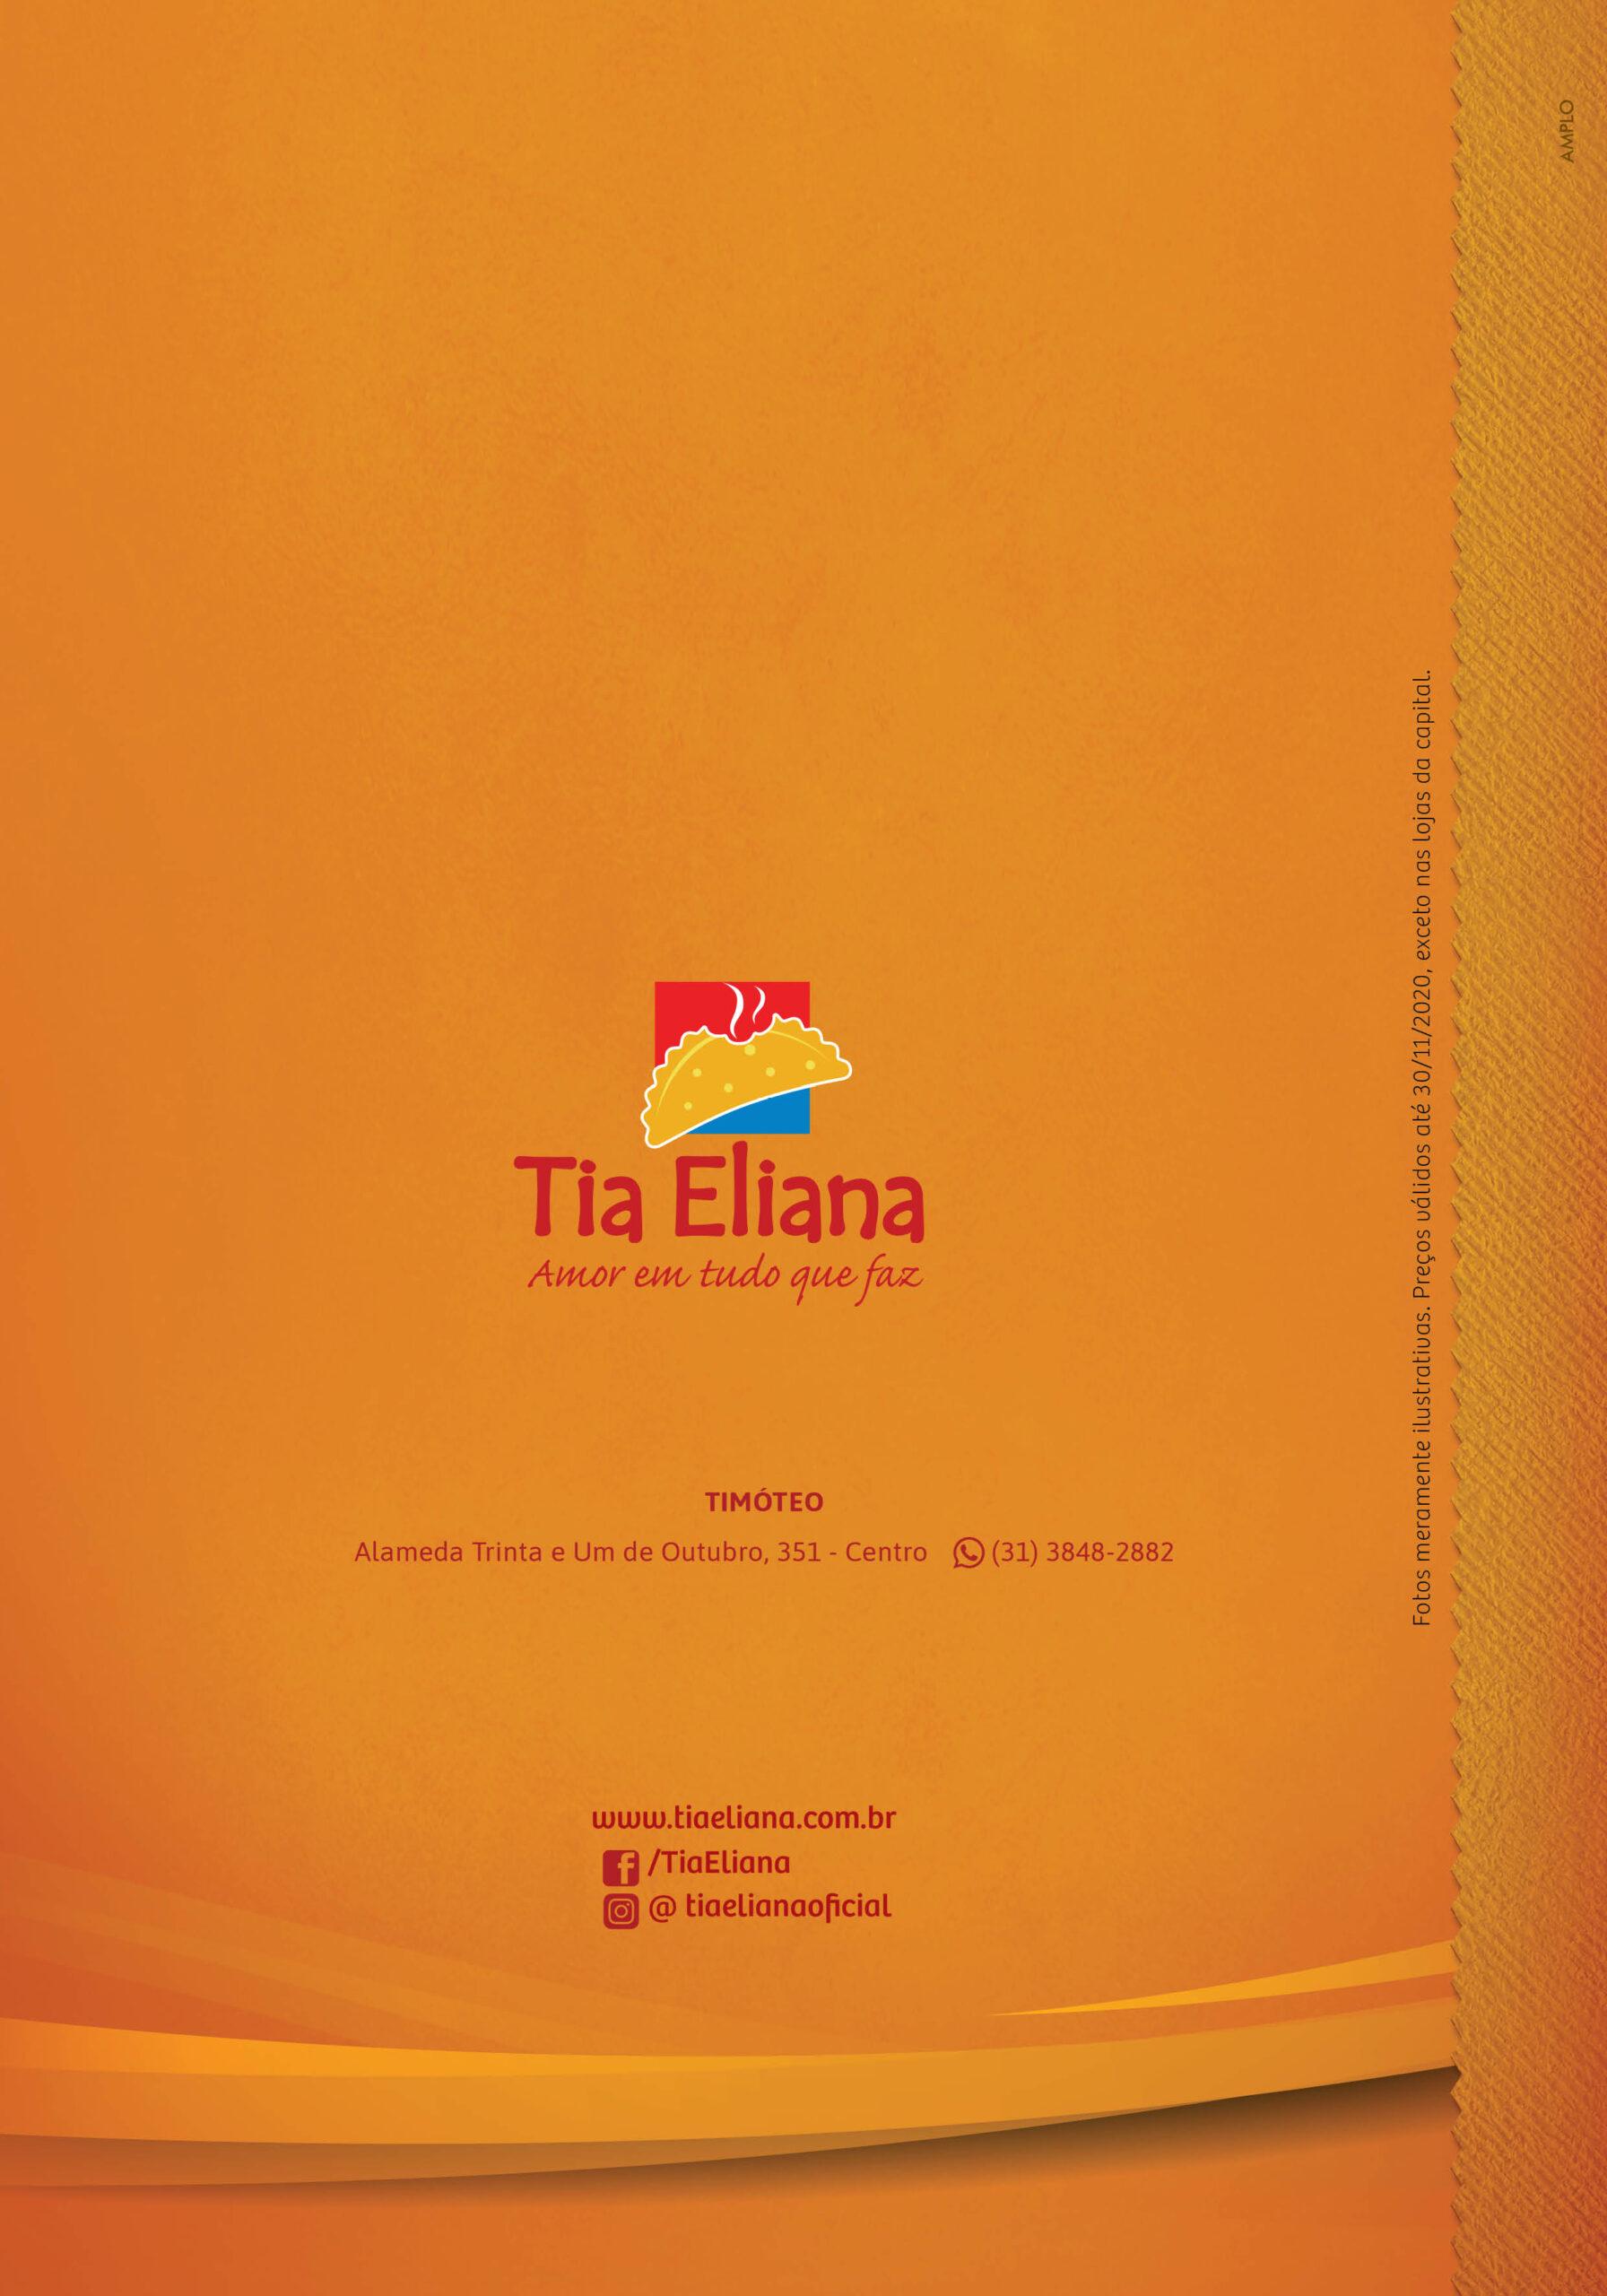 cardapio_completo_interior_a4_2021_tia_eliana_timoteo12-scaled Timóteo